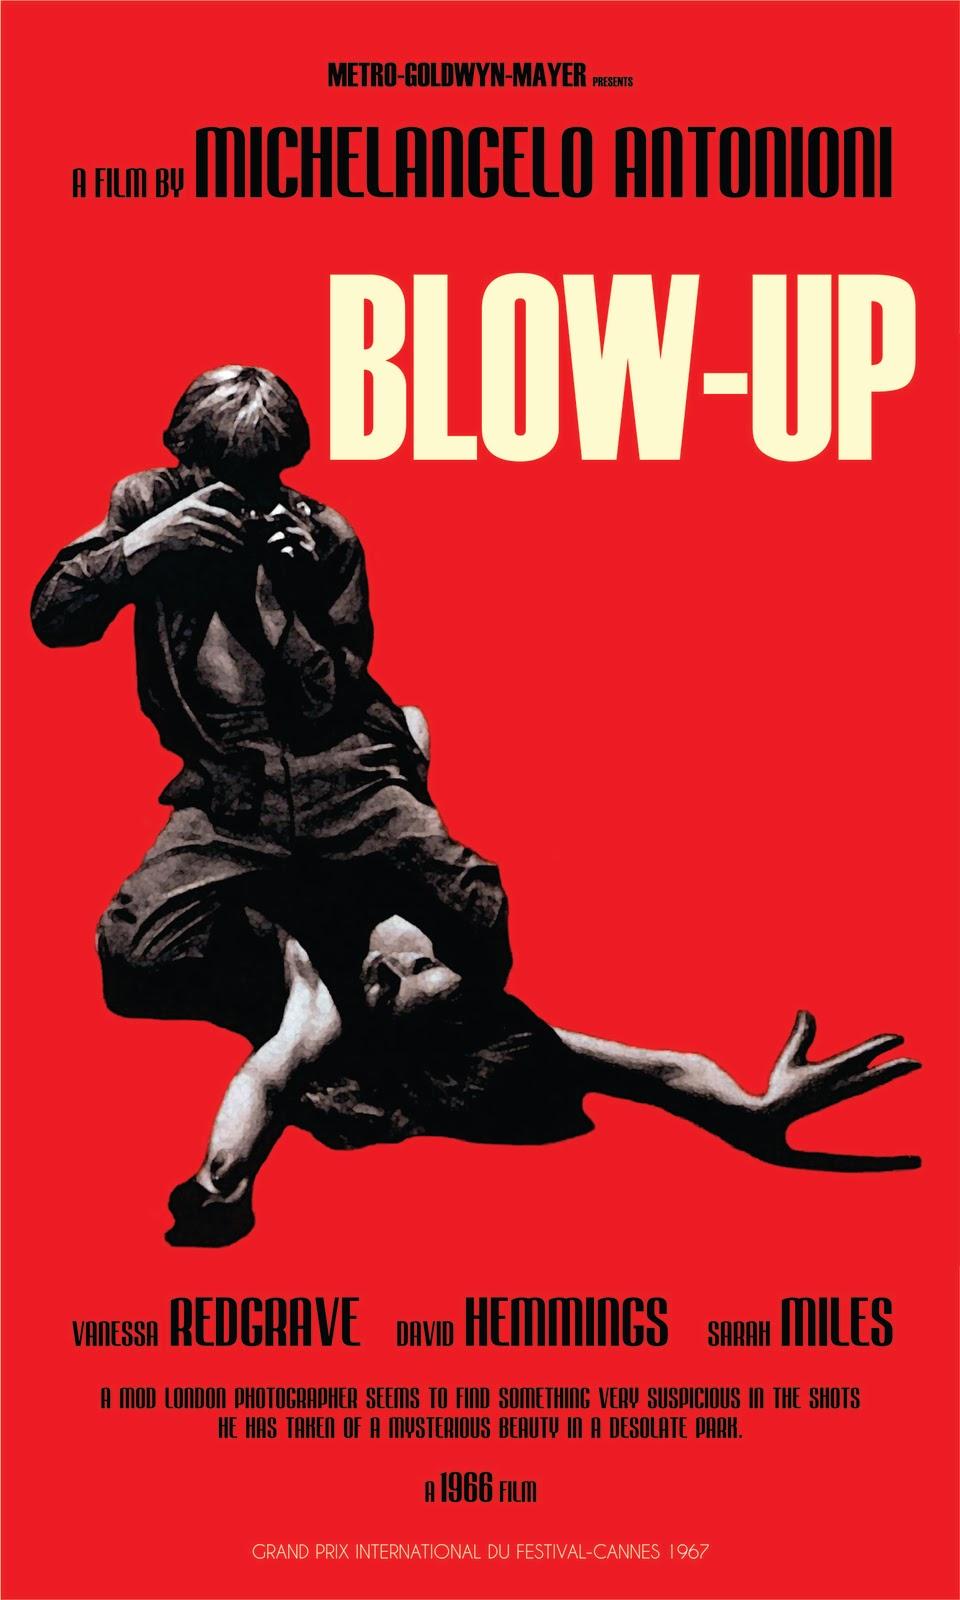 Cartel de la película Blow-Up